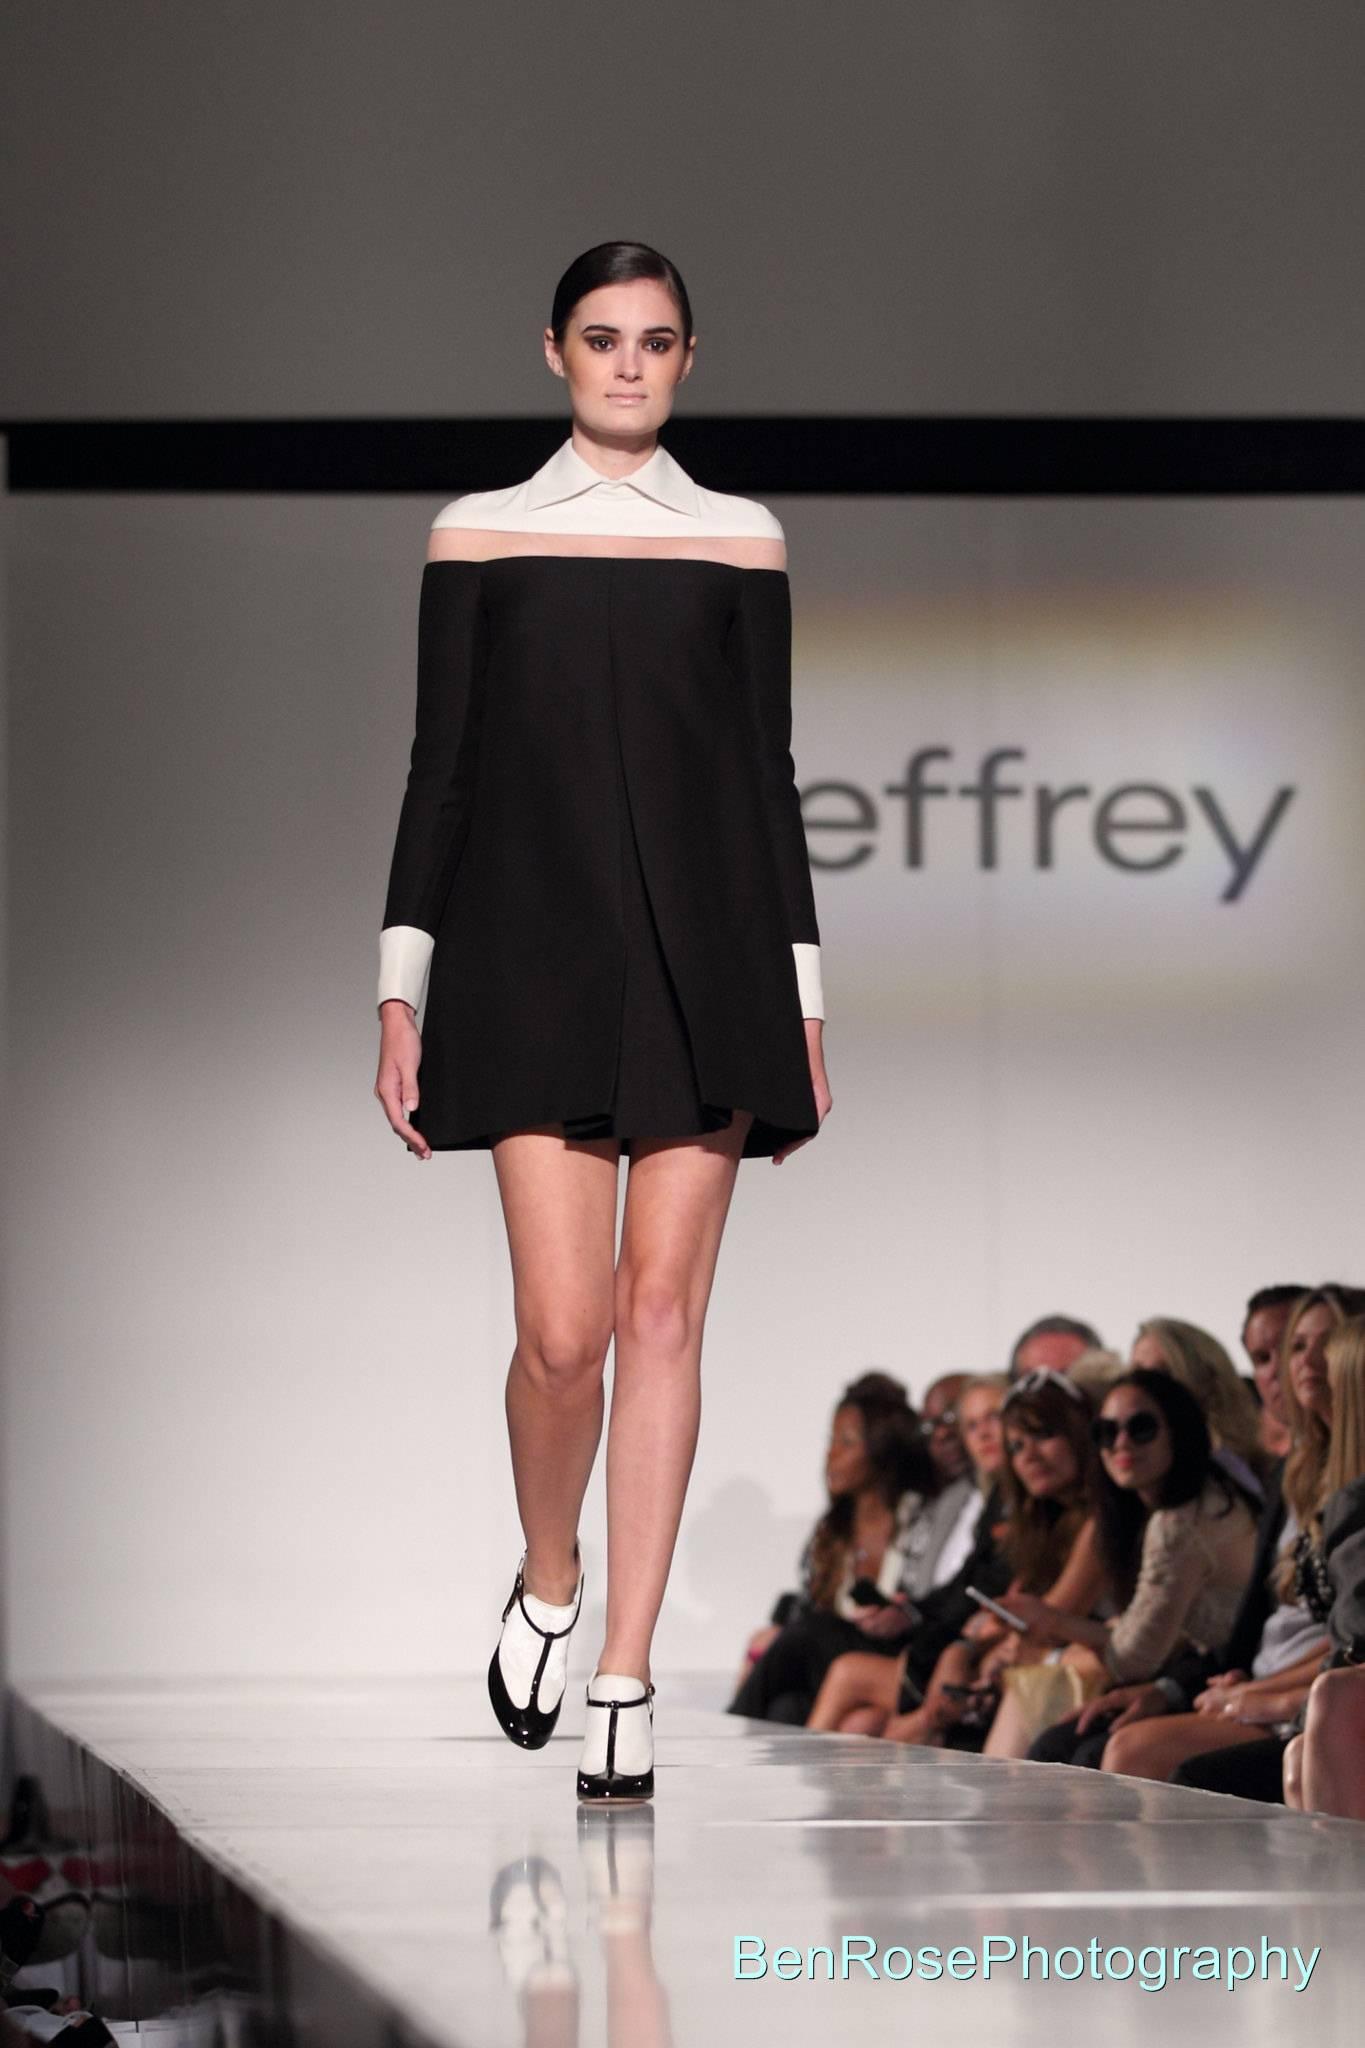 2013 Jeffrey Fashion CaresPhoto by Ben Rose www.BenRosePhotography.com